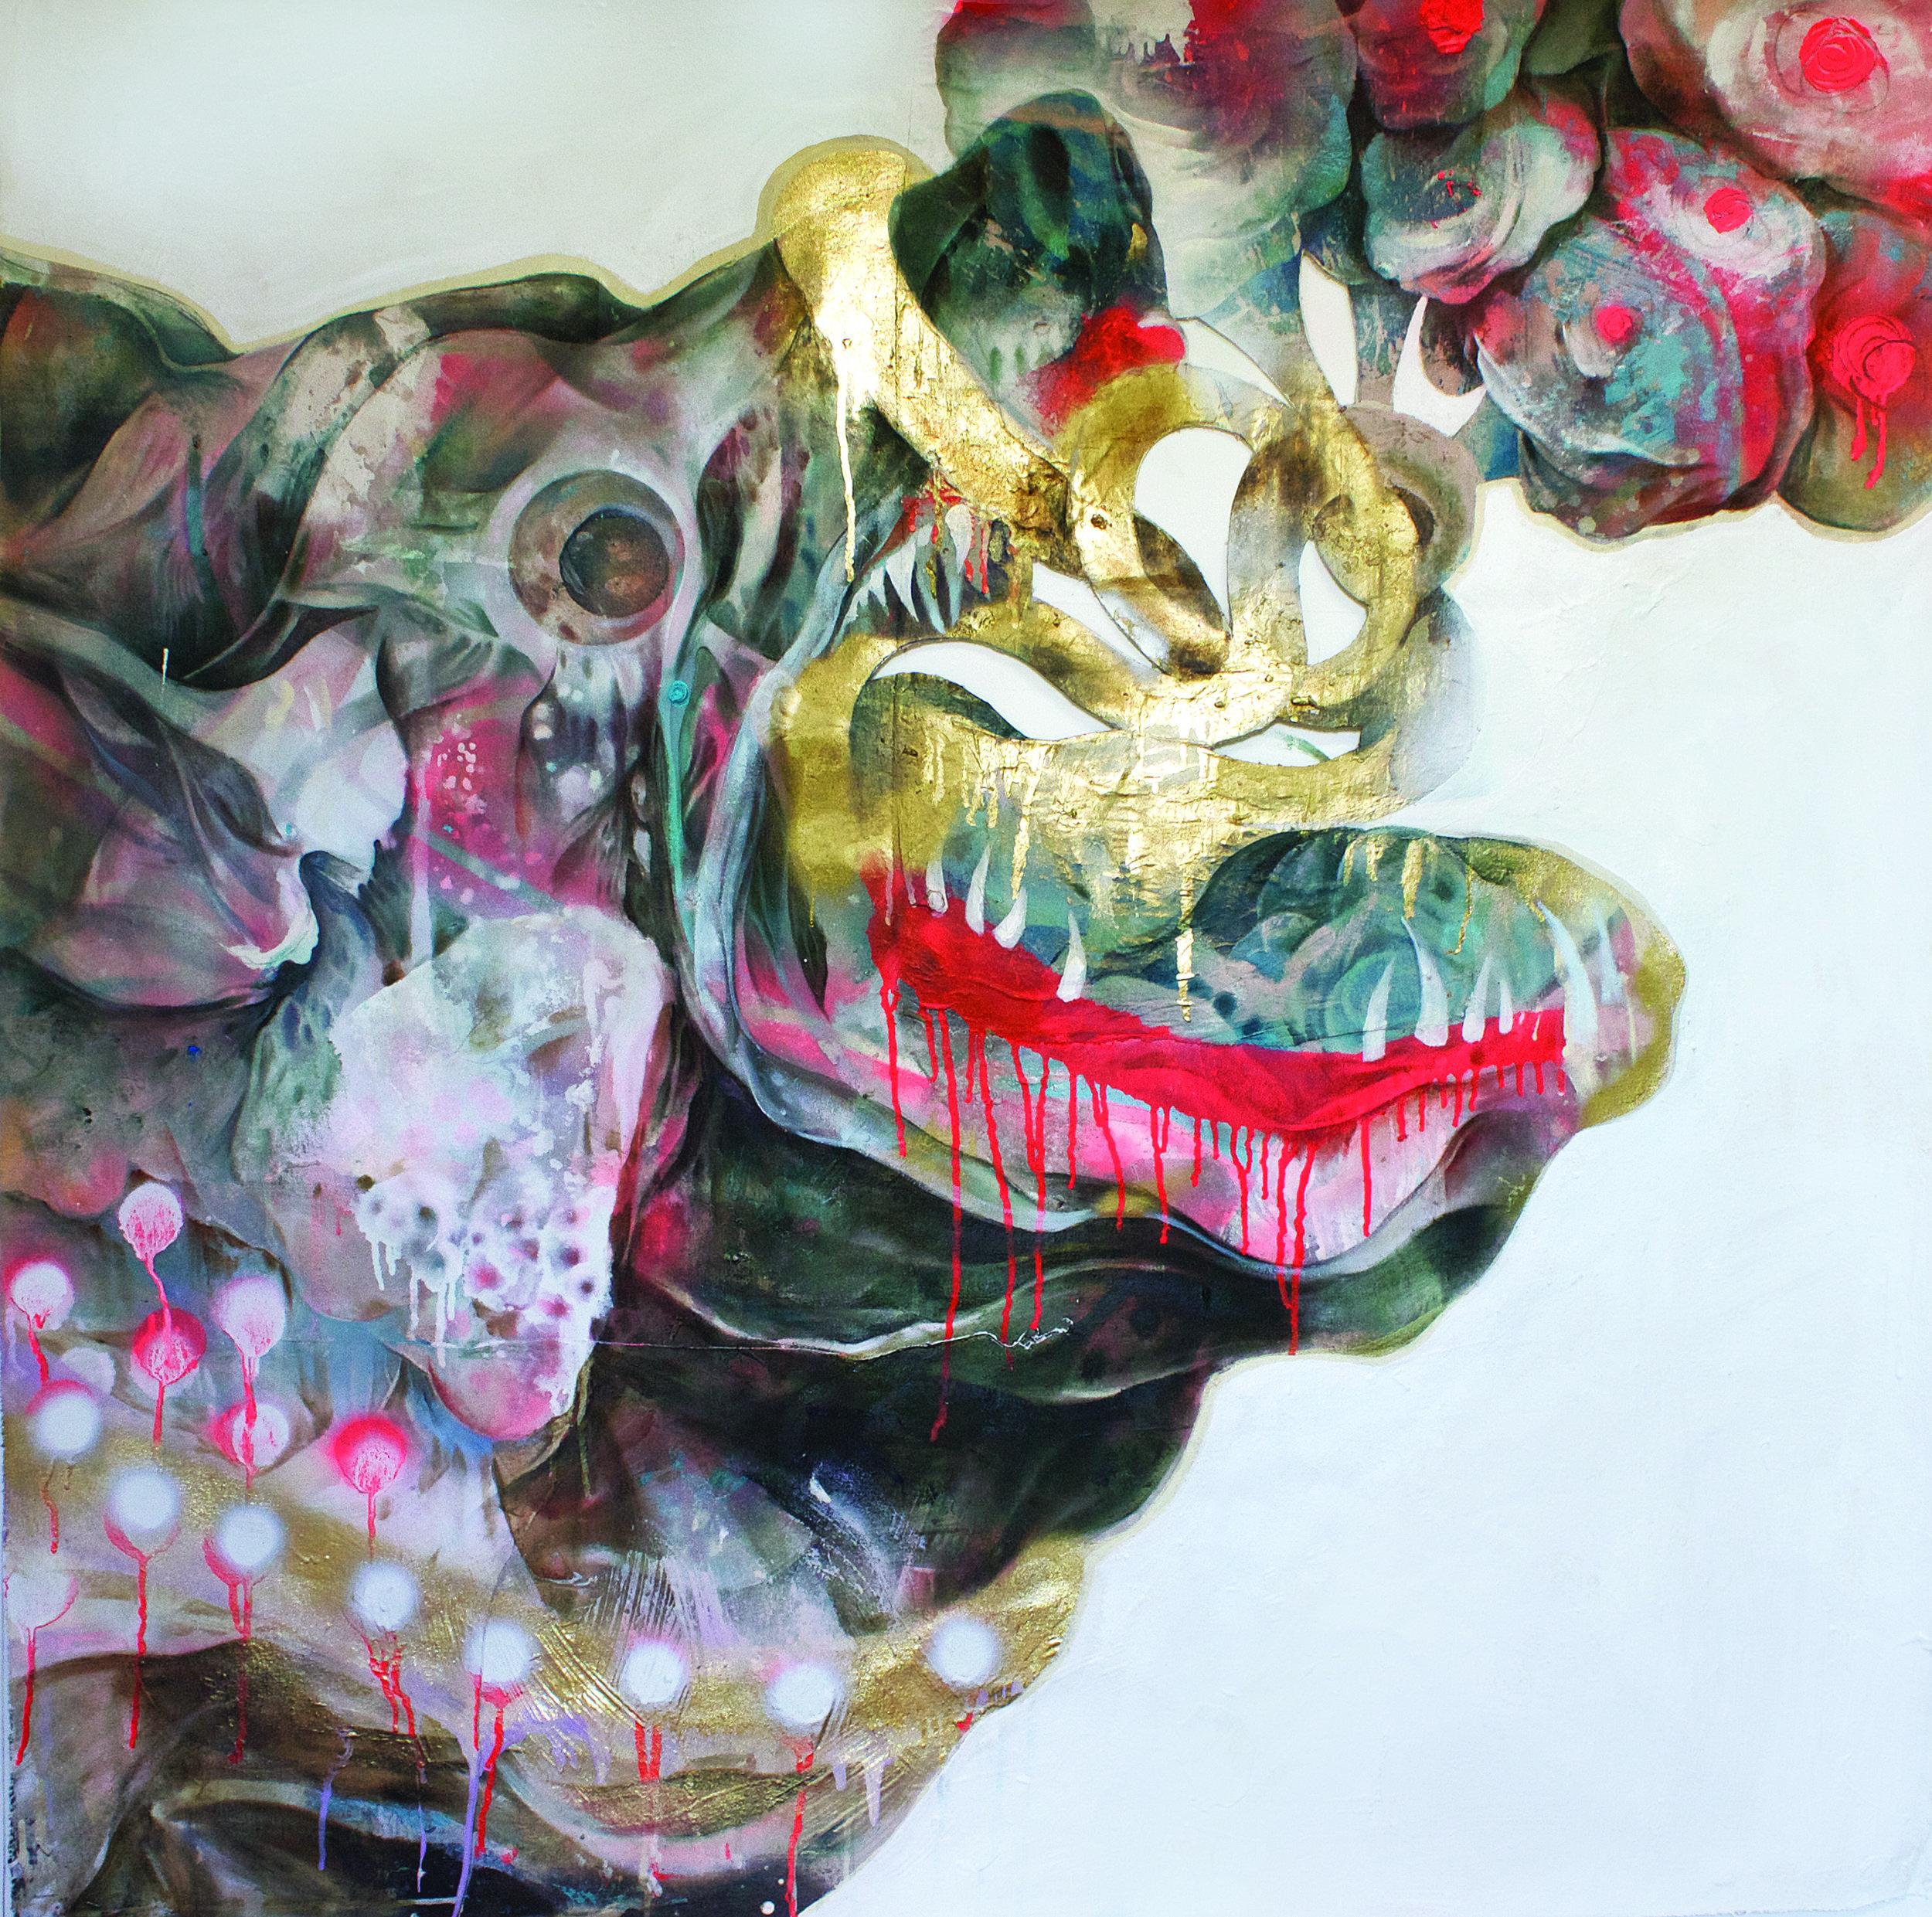 """Dog Bark Break The Night"", (48"" x 48"") by Lavar Munroe, acrylic, spray paint and found fabric on canvas. 2017  (Image courtesy of artist)"